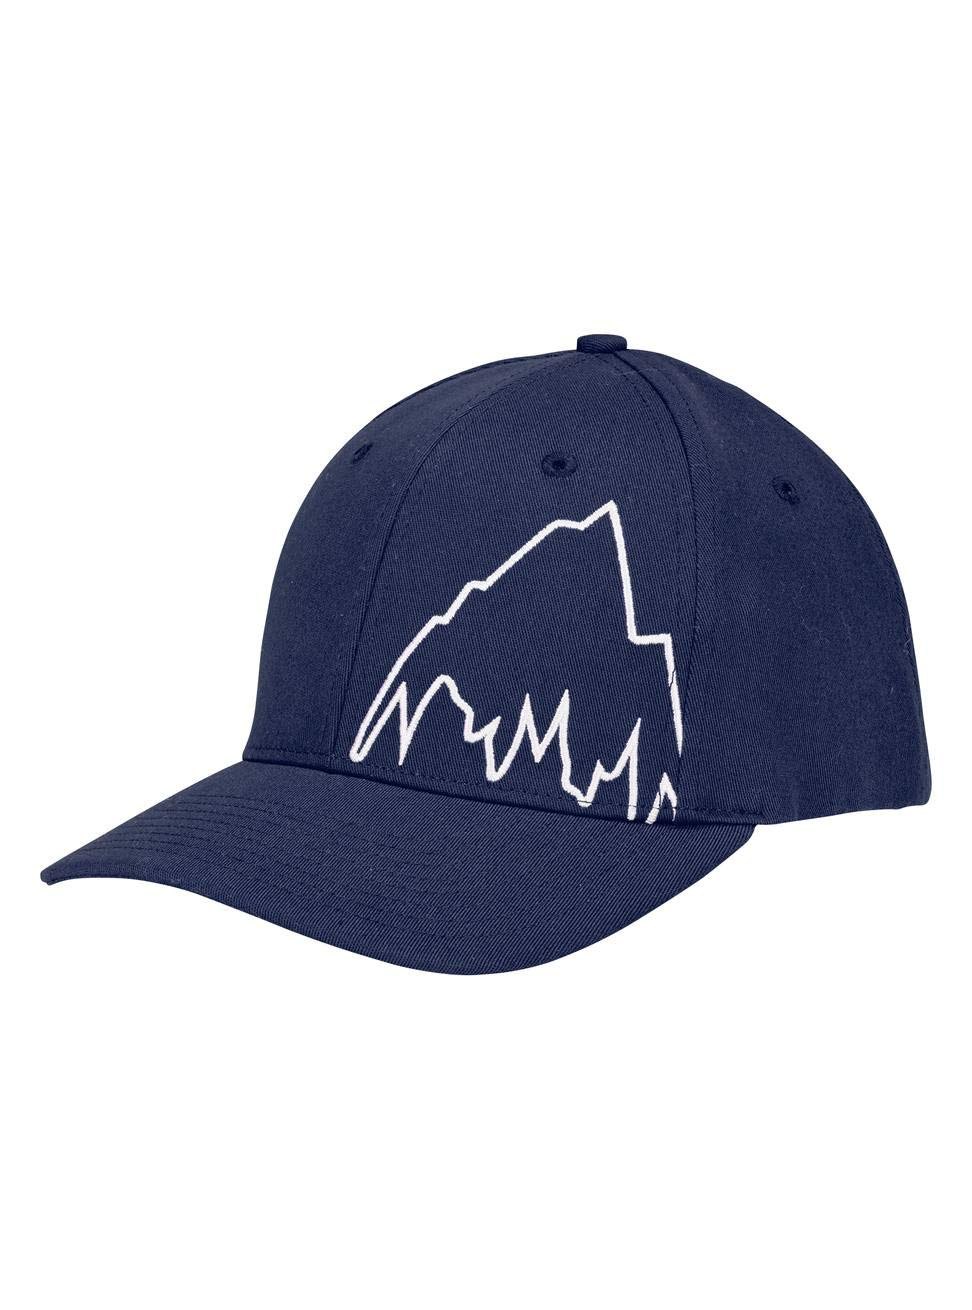 Burton Mountain Slidestyle, Cappello Uomo, Monument, Taglia Unica 13742105020